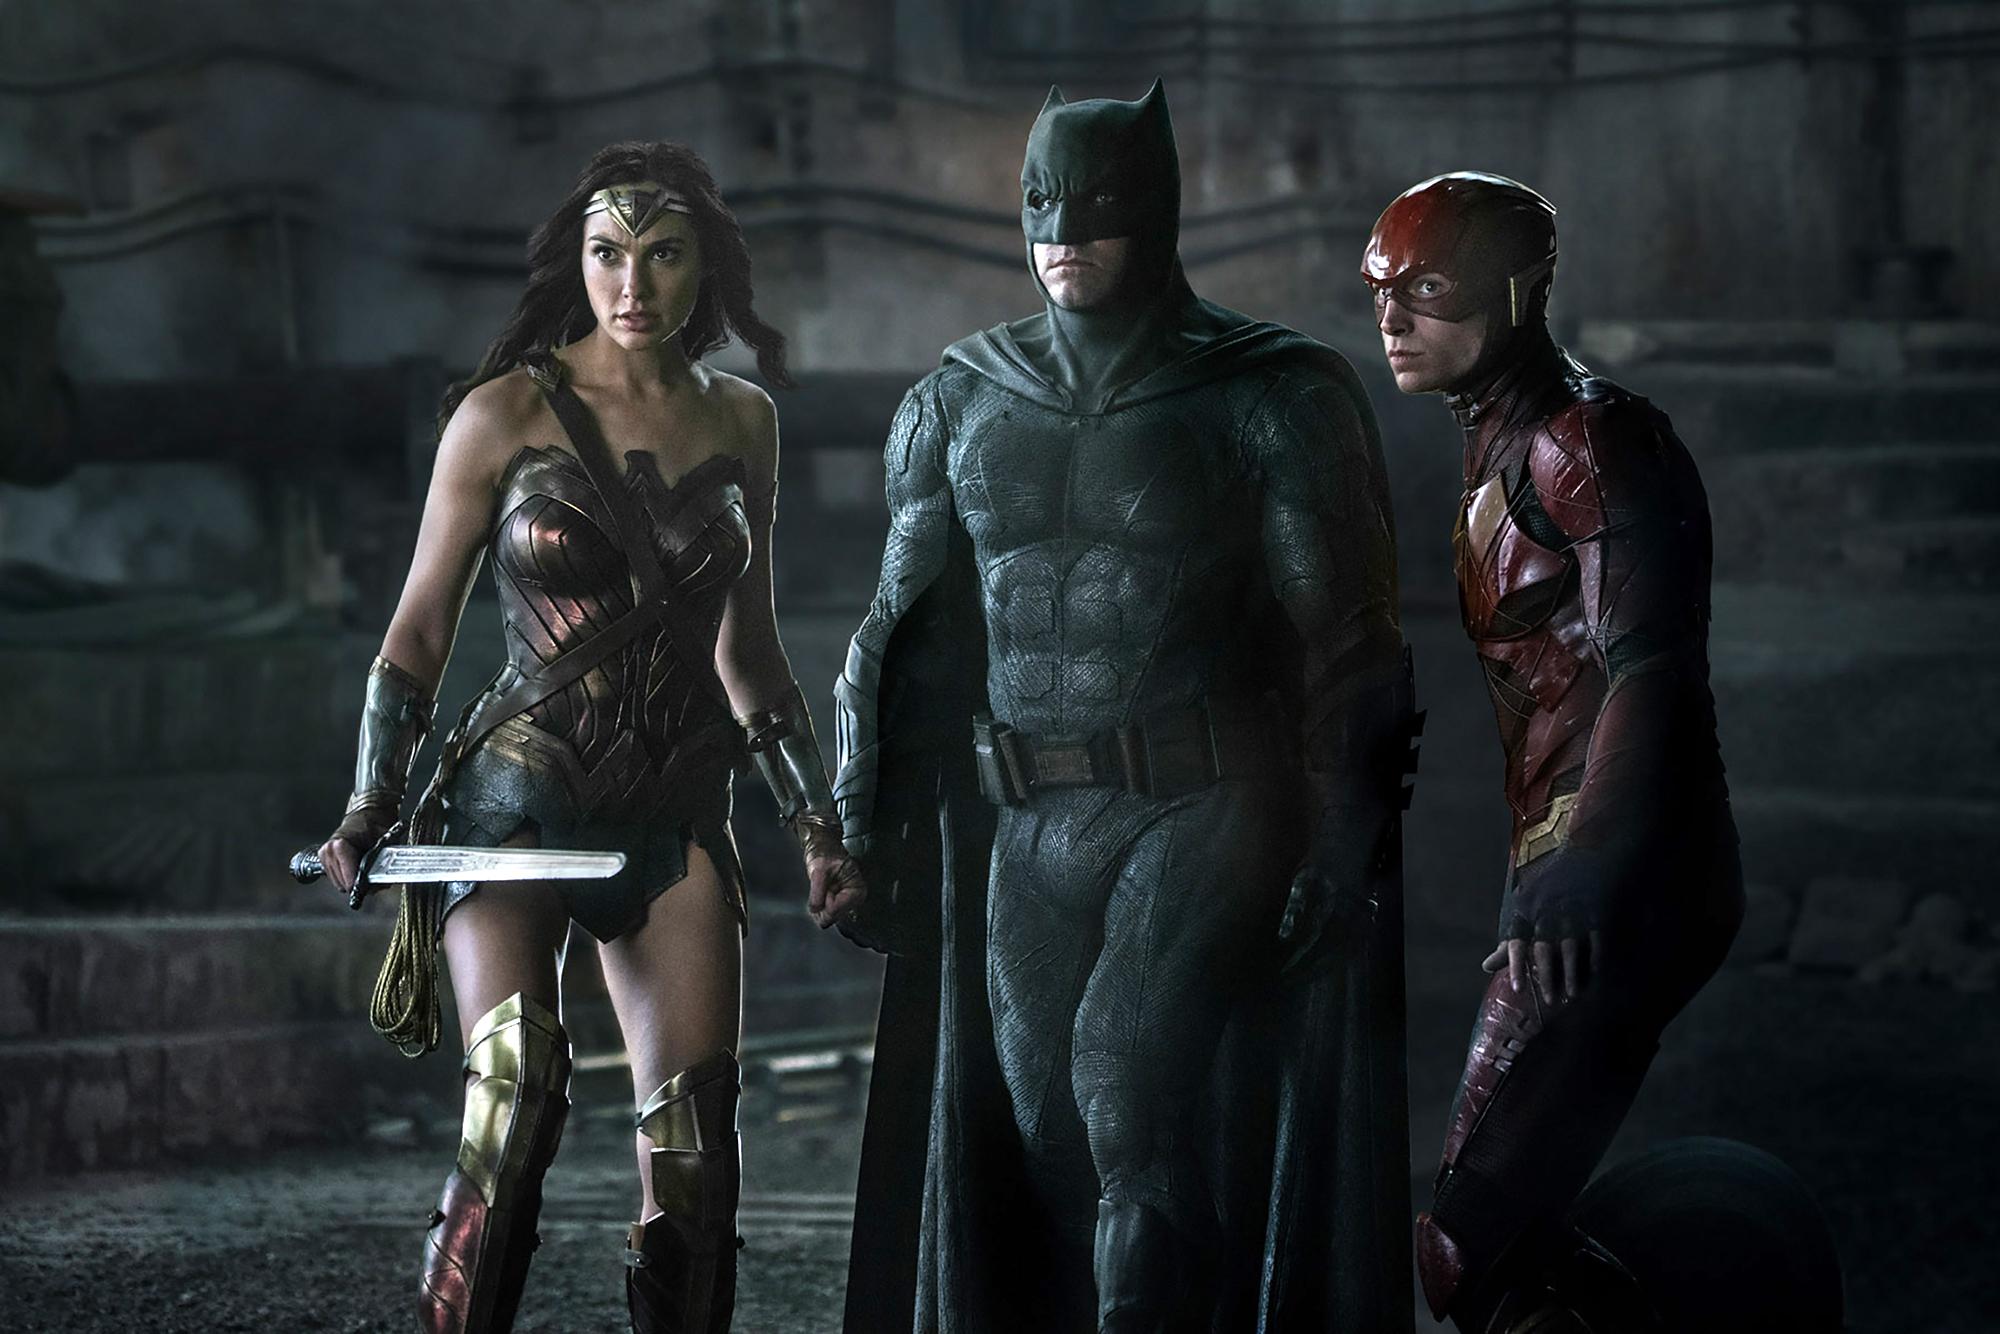 El actor Ben Affleck regresará como Batman en The Flash junto a Michael Keaton